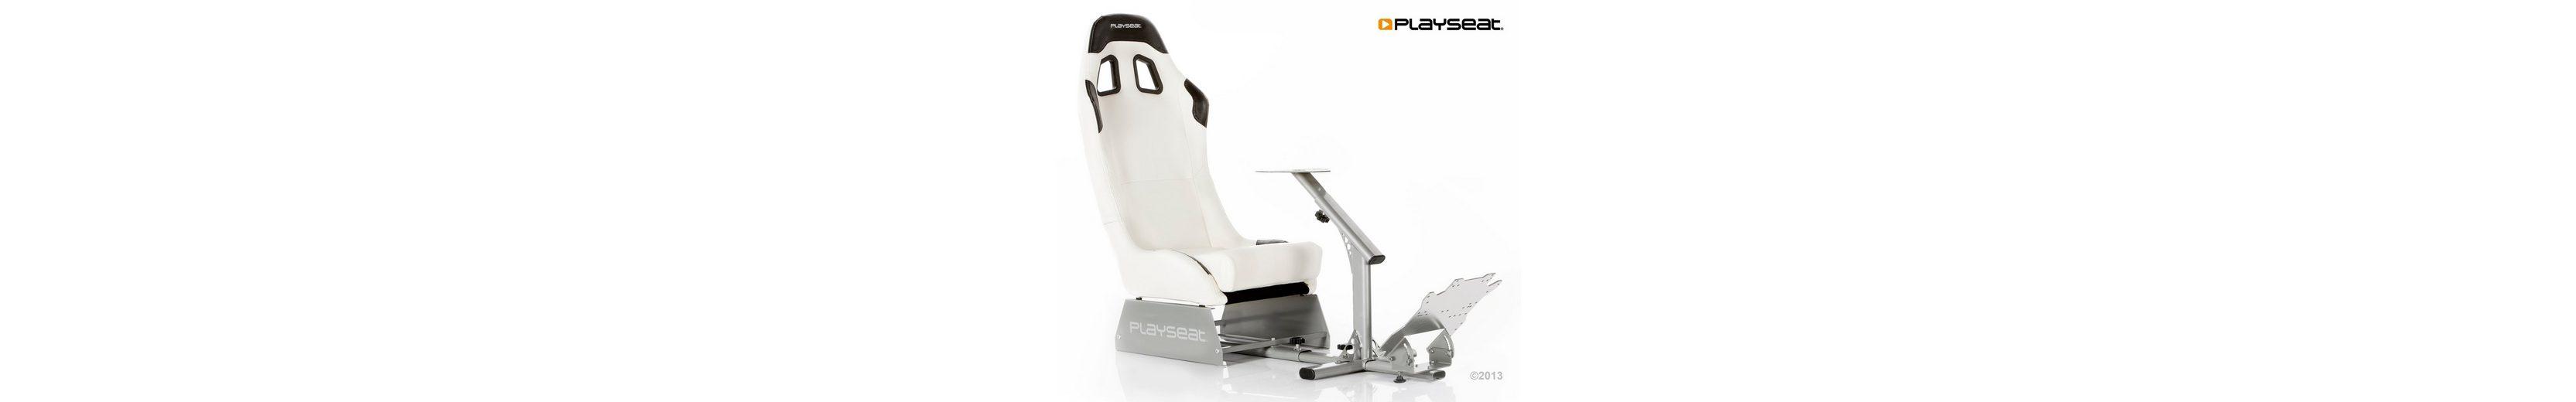 Playseats Rennsitz Playseat Evolution M Weiß/Silber »(PS3 PS4 PC X360 XBox One)«